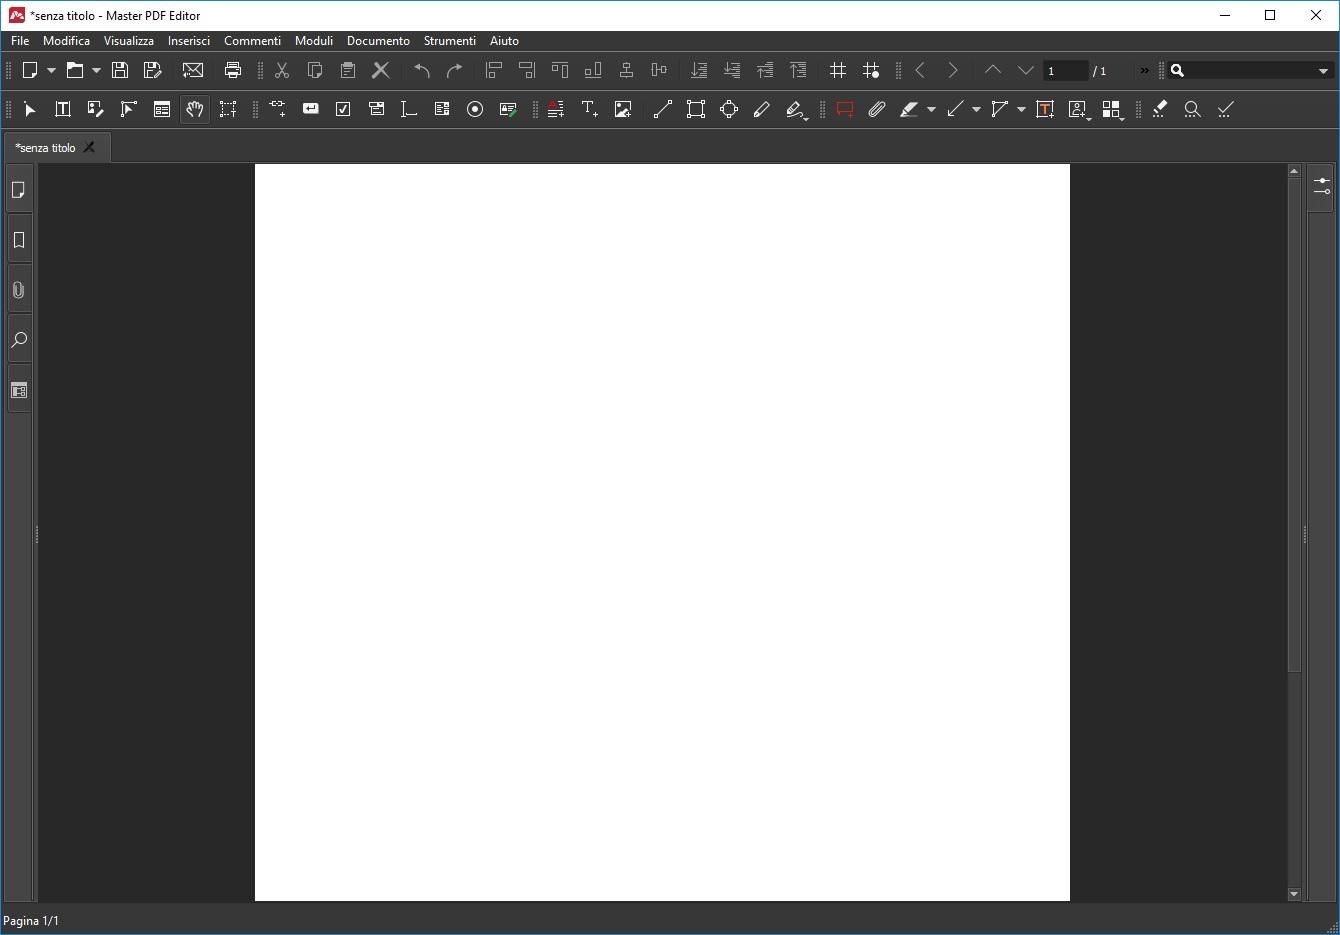 [PORTABLE] Master PDF Editor v5.4.33   - Ita